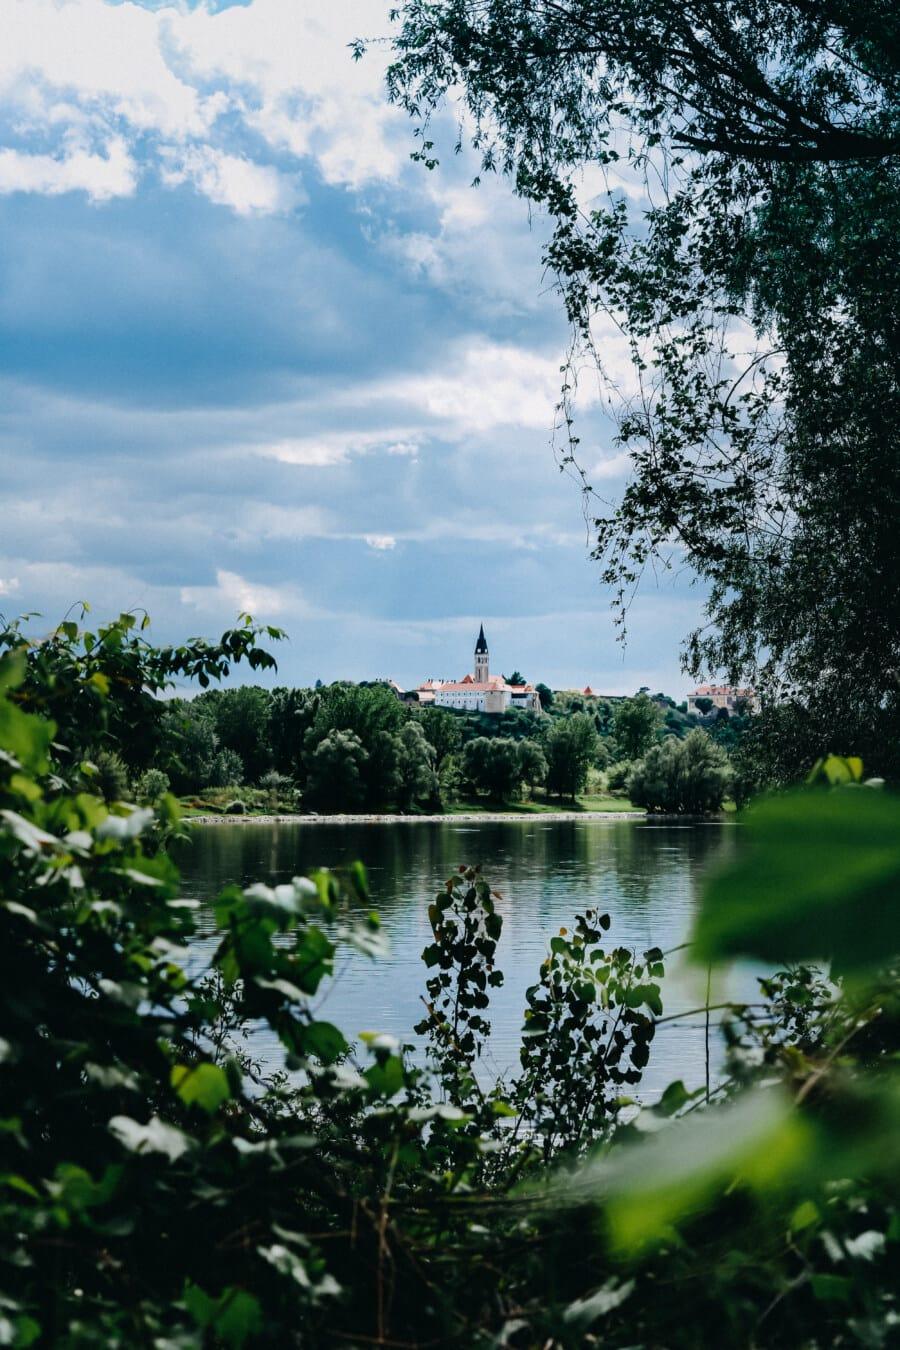 church tower, castle, distance, riverbank, river, landscape, swamp, lake, tree, water